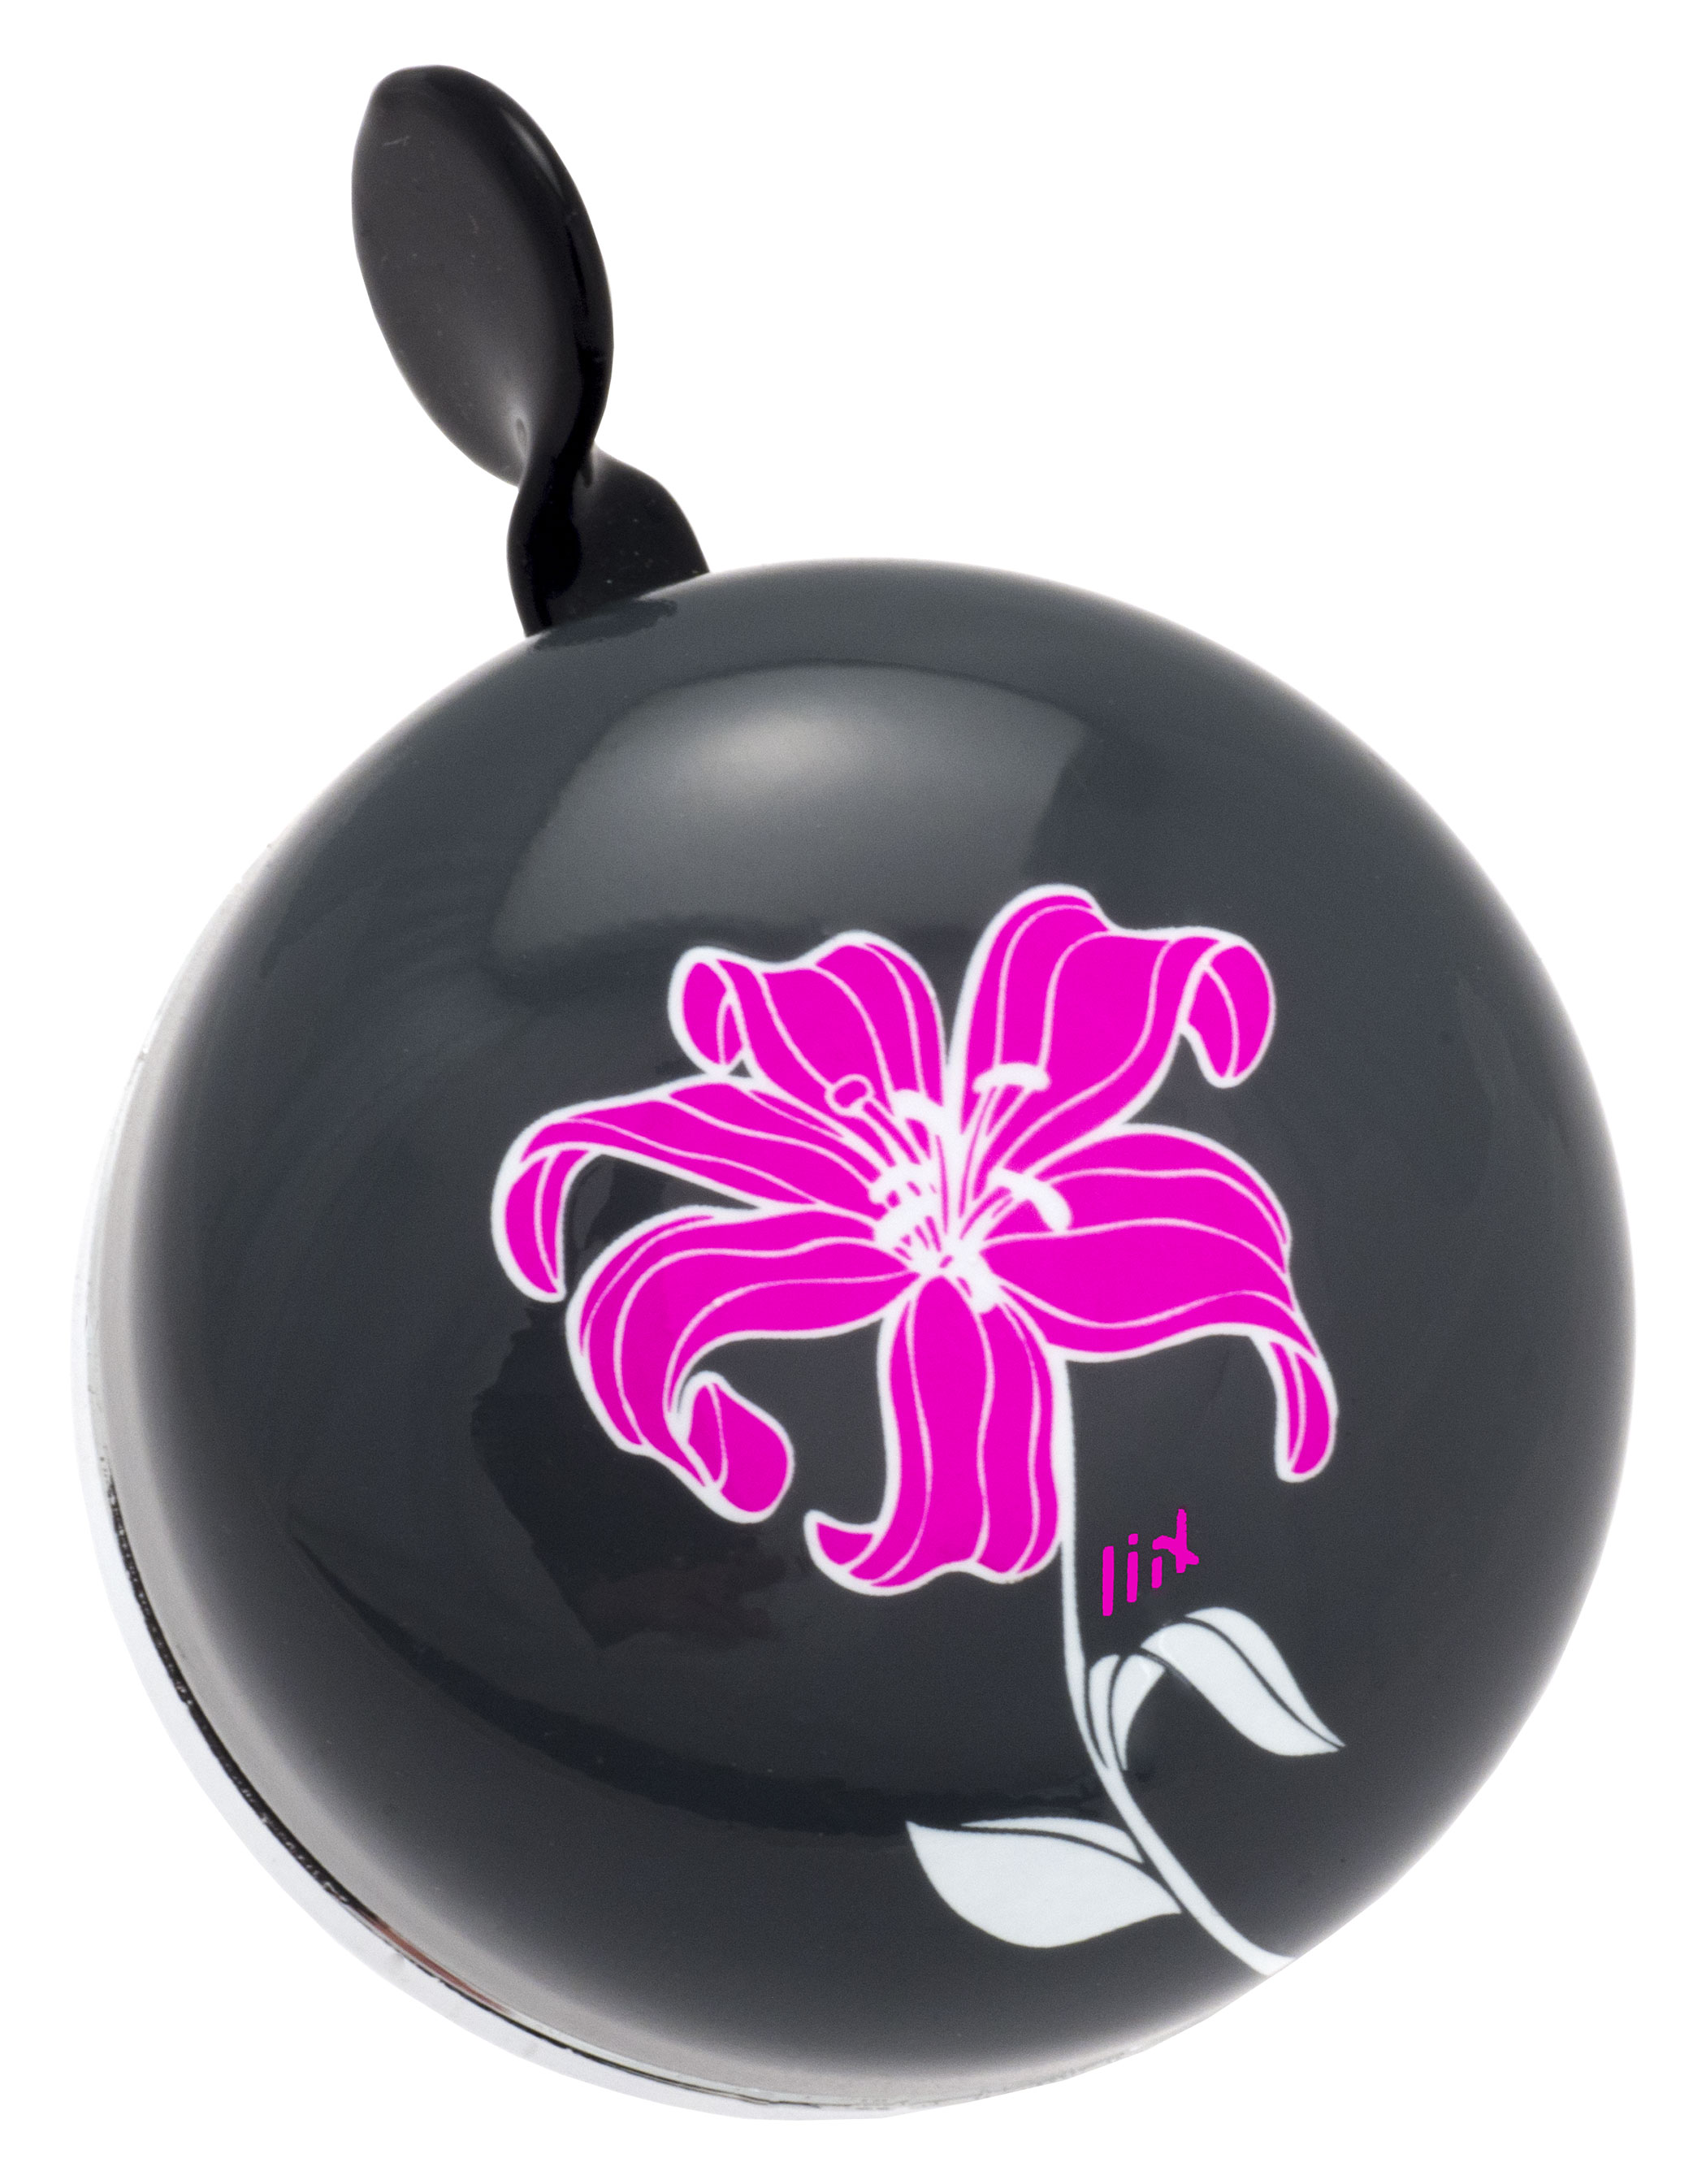 Liix Mini Ding Dong Fahrradklingel Flower